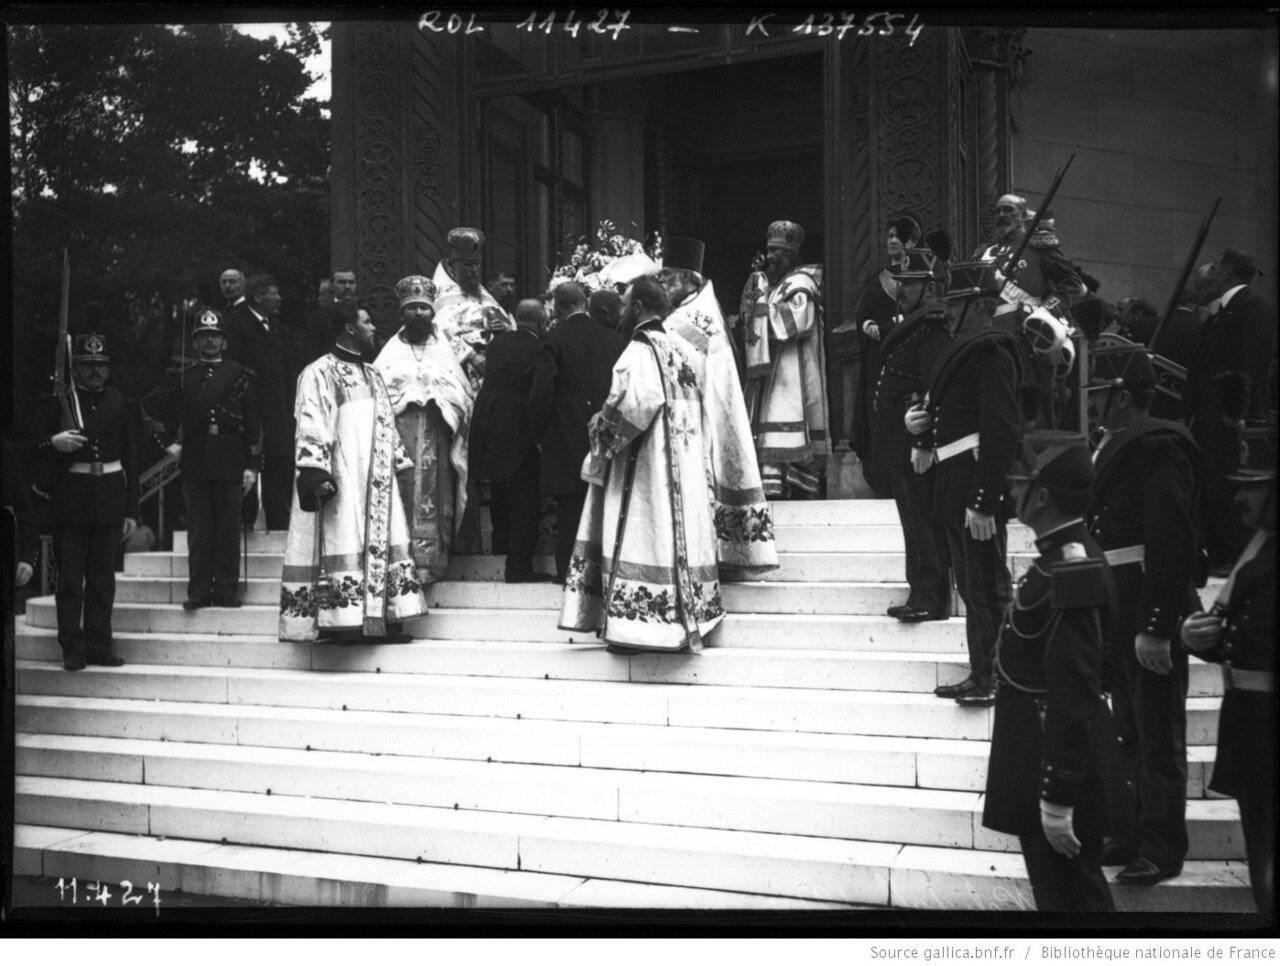 1910. 20 �������� 1910. �������� ���������� ��������� ��������, ����� ������ �� �������